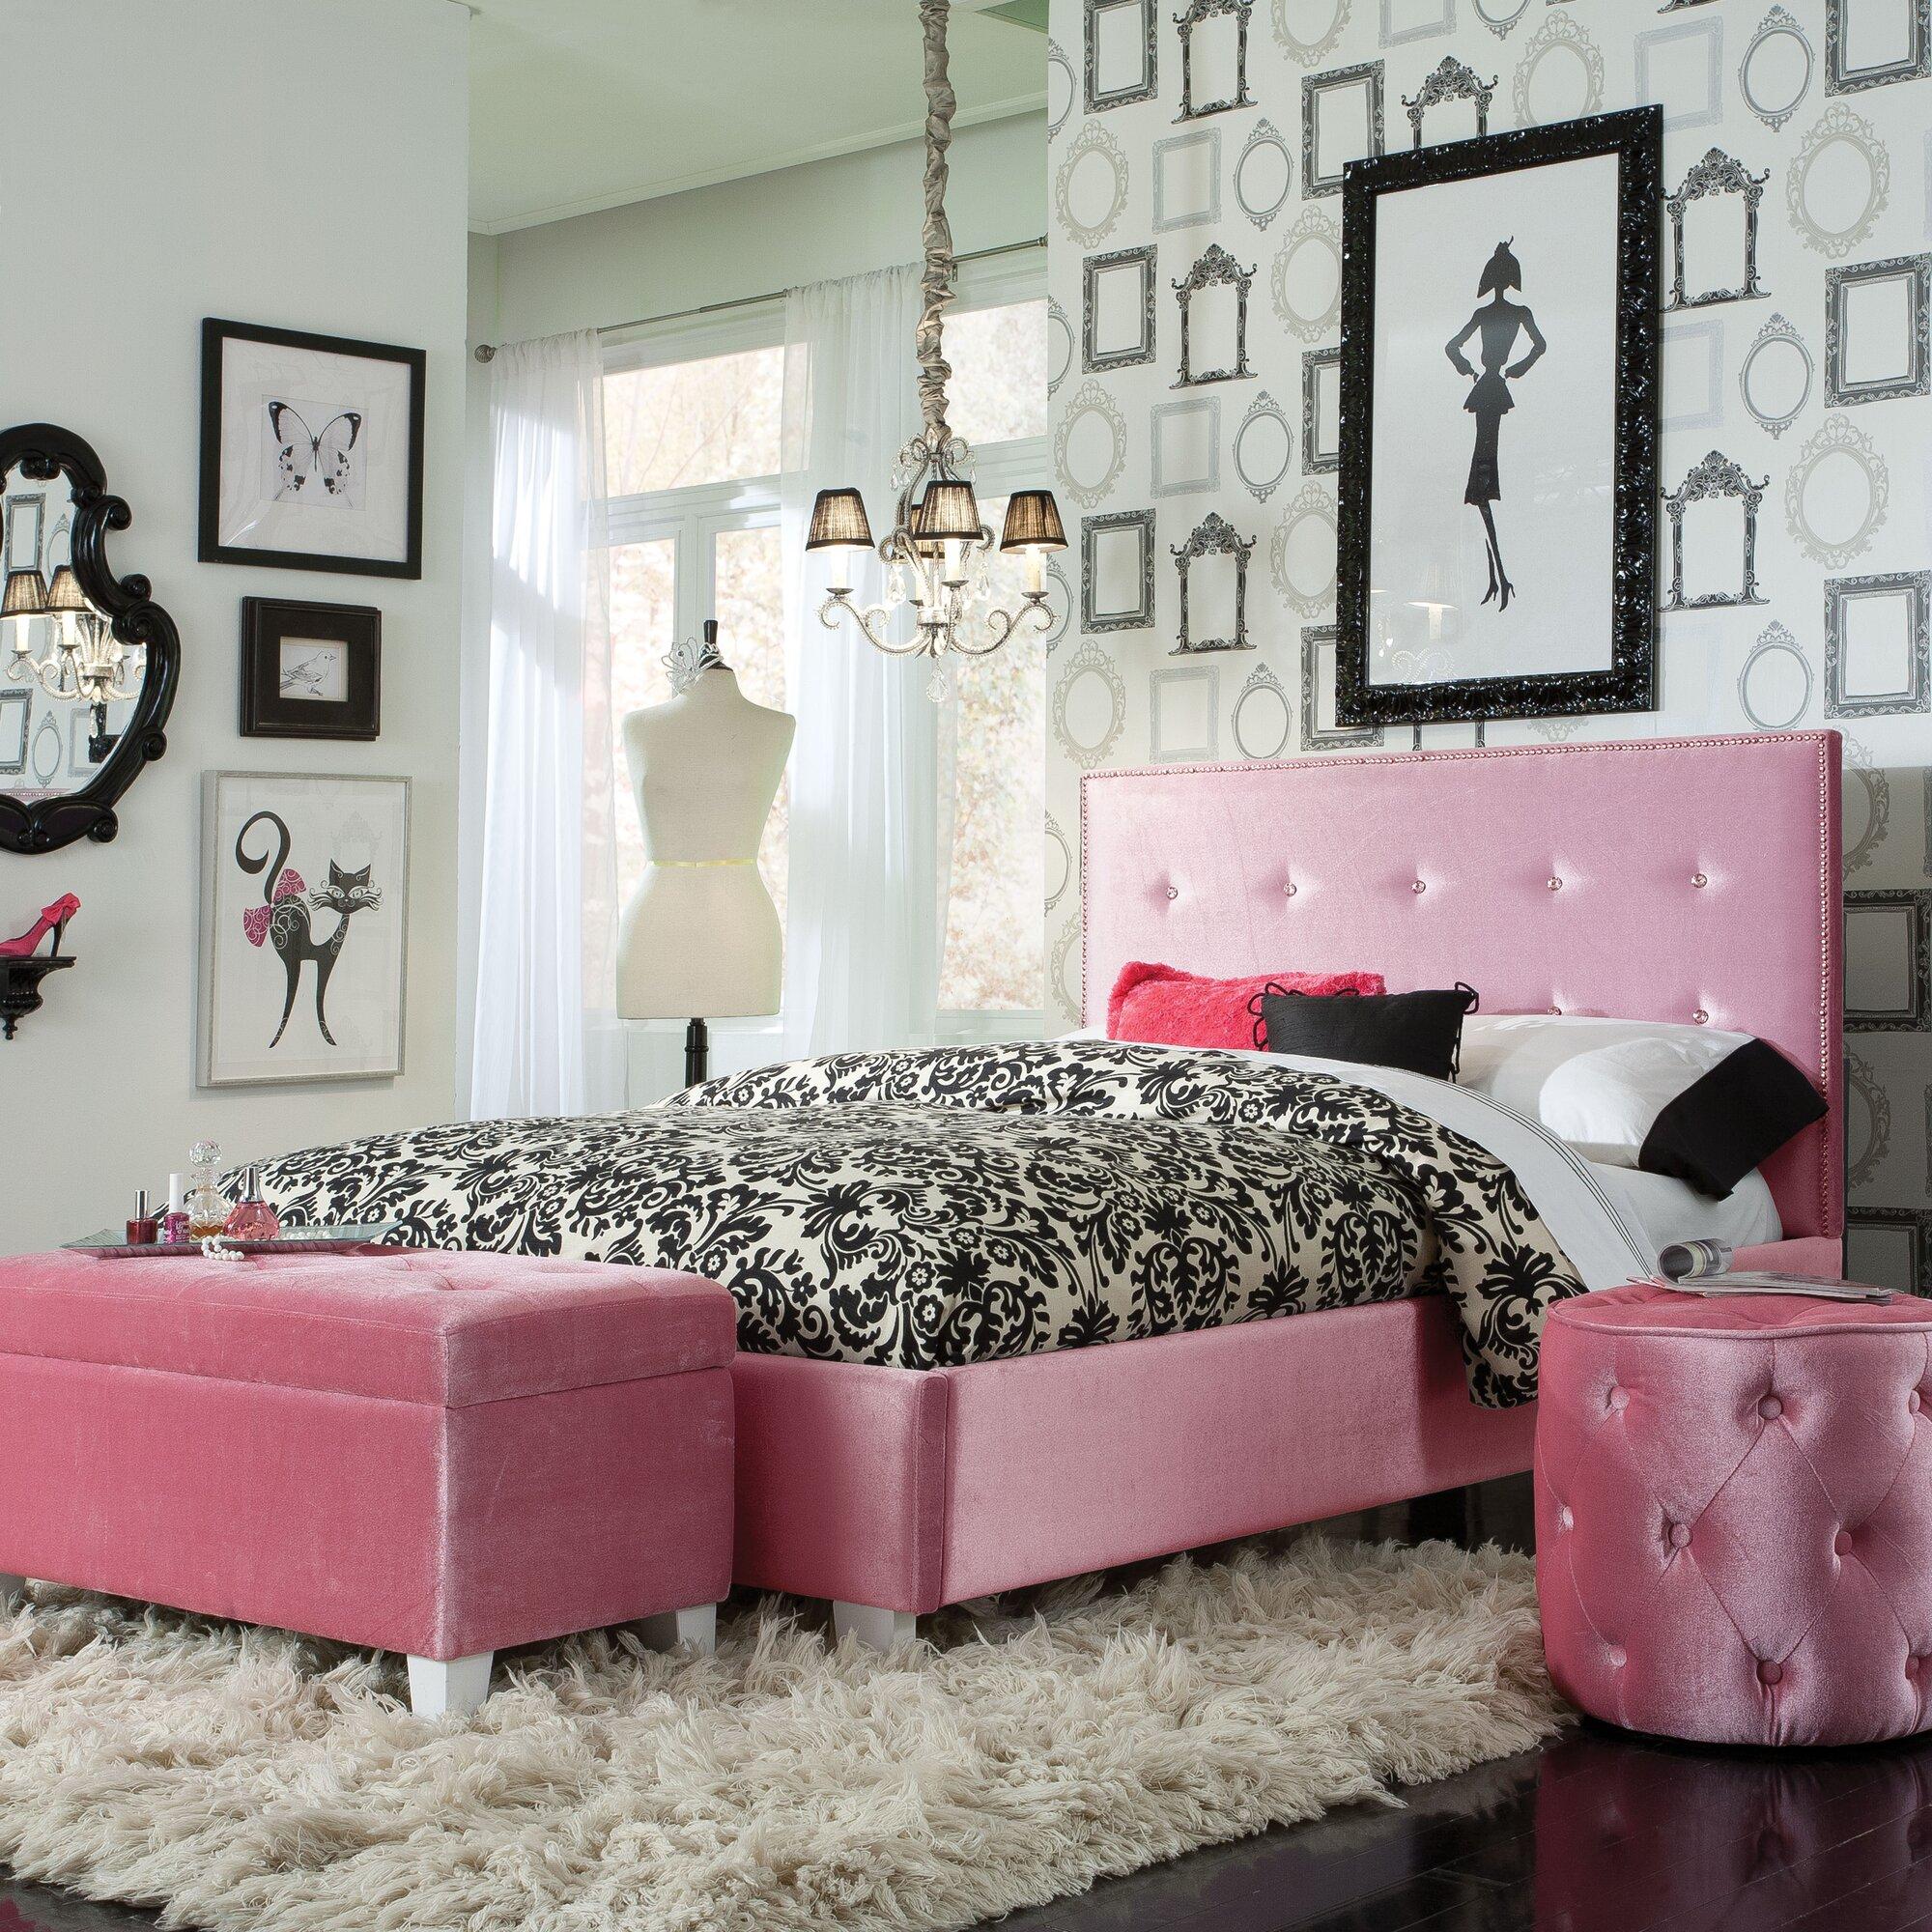 Kids Bedroom Sets Youll Love Wayfair - Little girls bedroom furniture